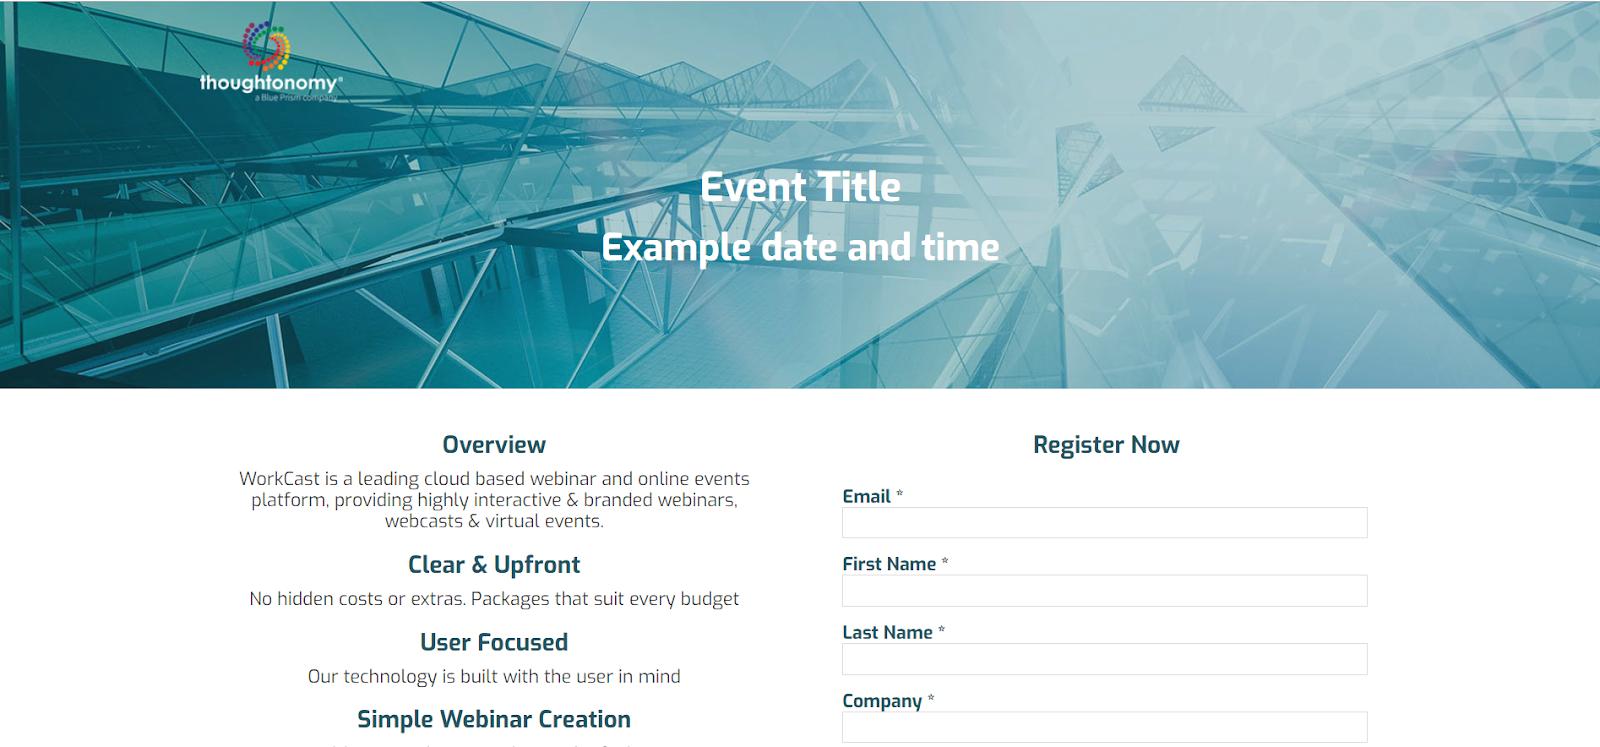 Best Webinar Design Example: thoughtonomy